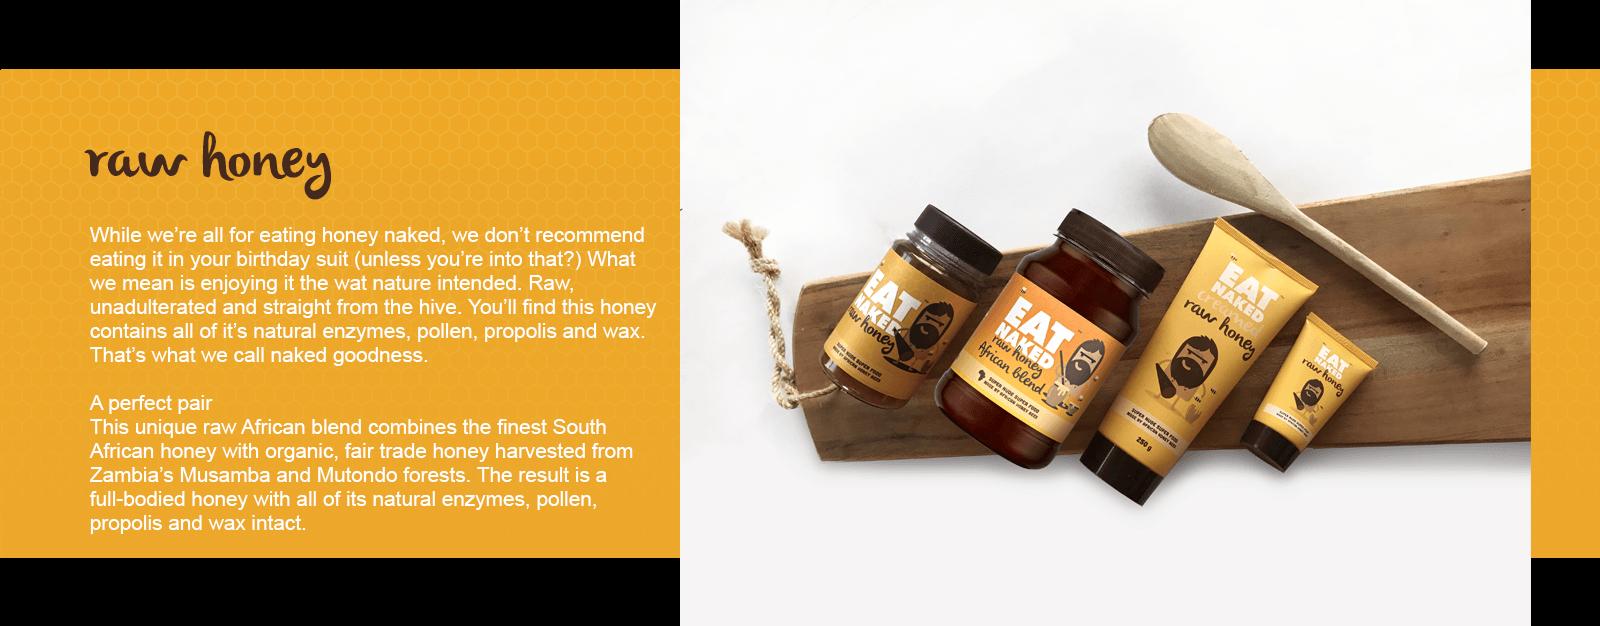 Product-1-raw-honey